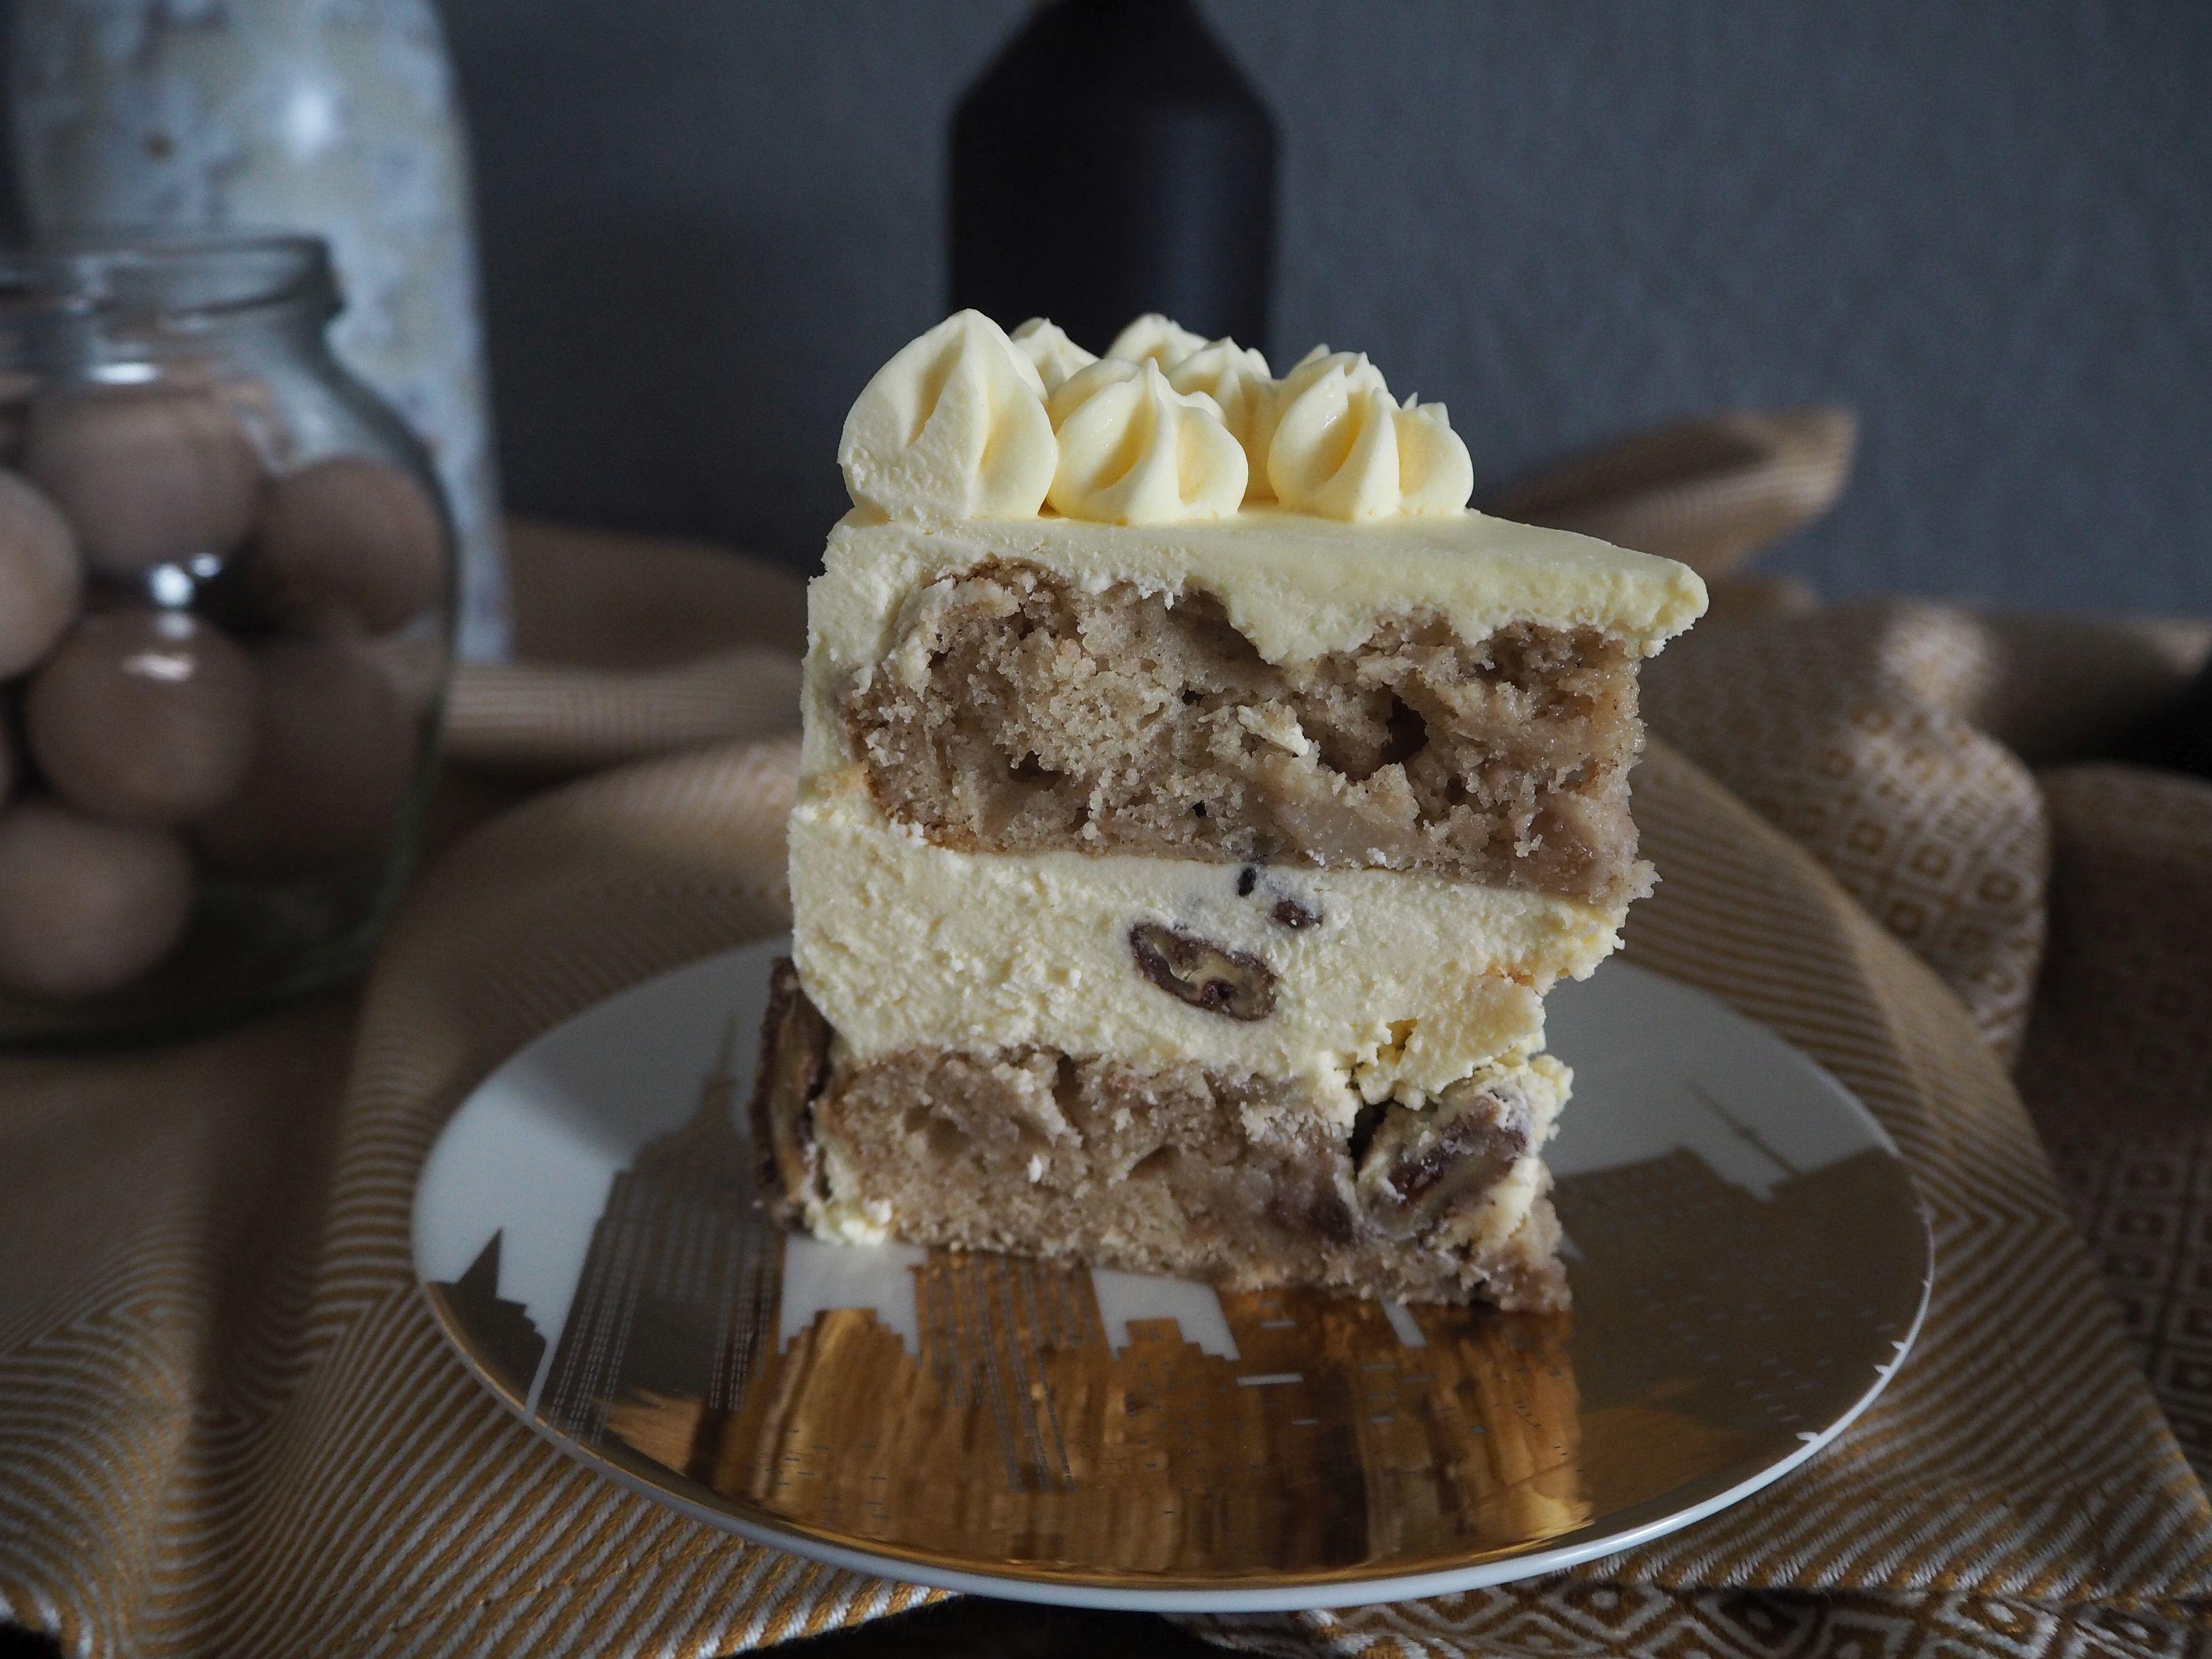 2017-12-skoen-och-kreativ-adventskalender-cookie-and-cake-love-birnen-pekannuss-cake (11)